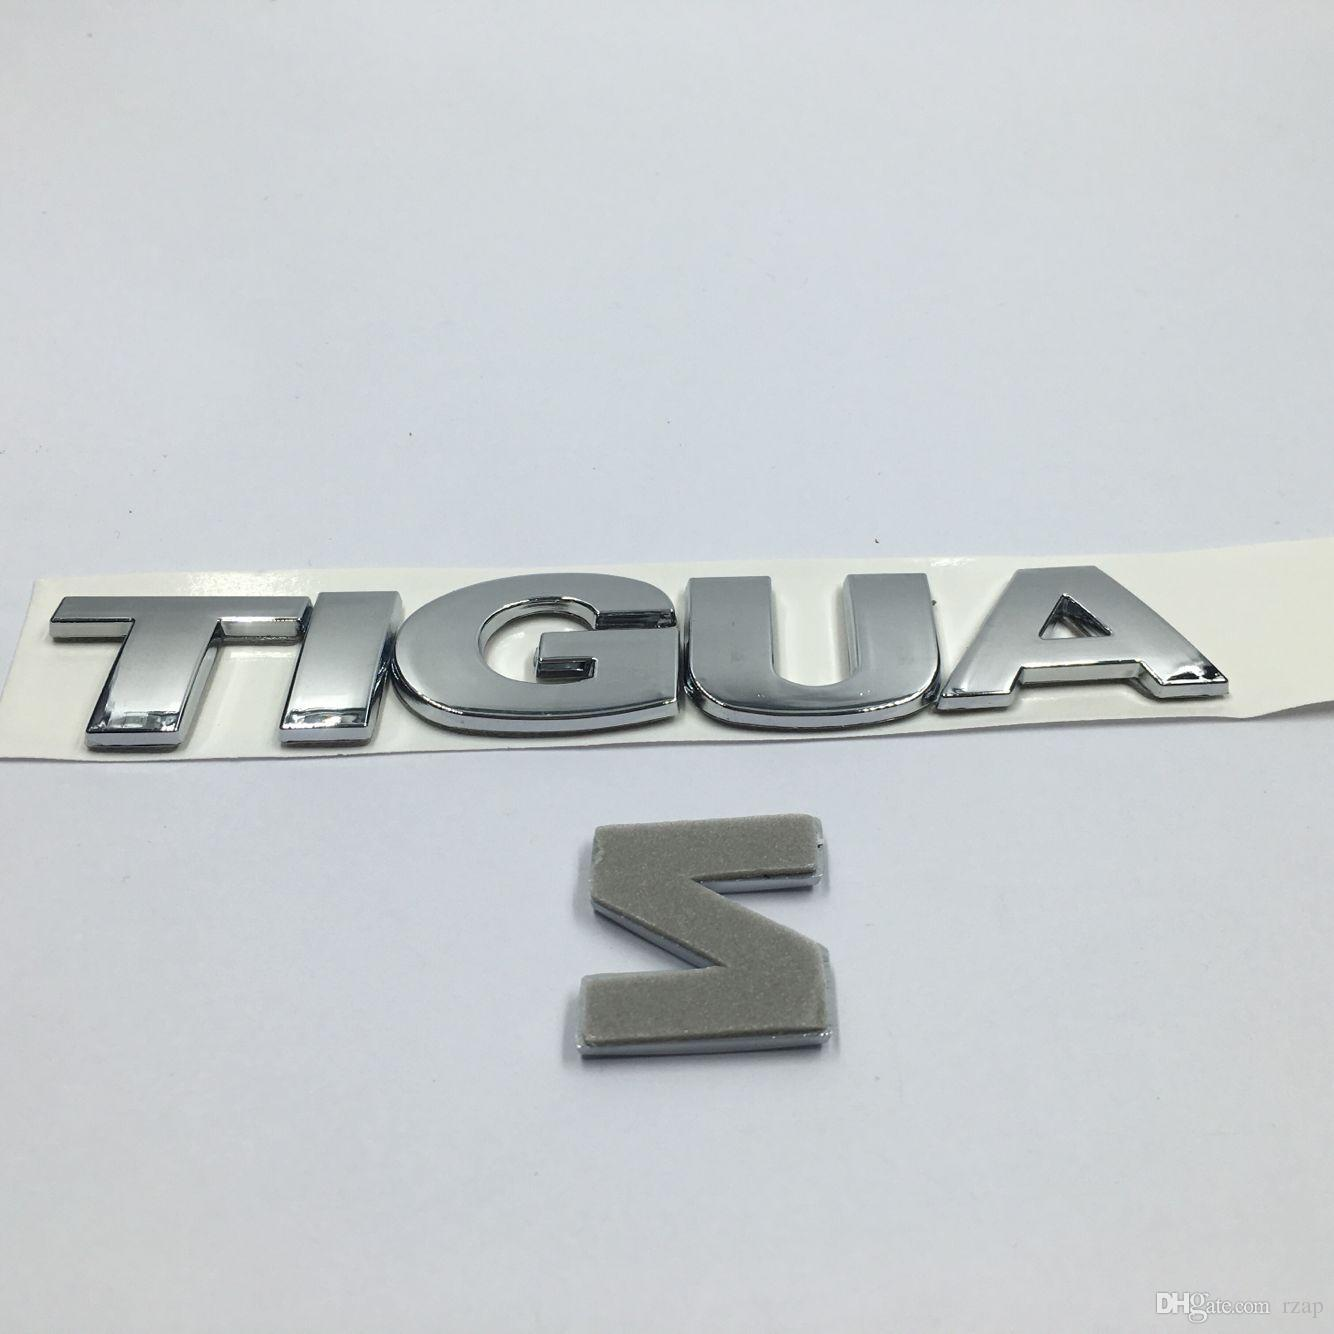 Car Rear Trunk Lid Chrome Emblem Badge Tiguan Letter Logo Sticker fit for VW Volkswagen Tiguan